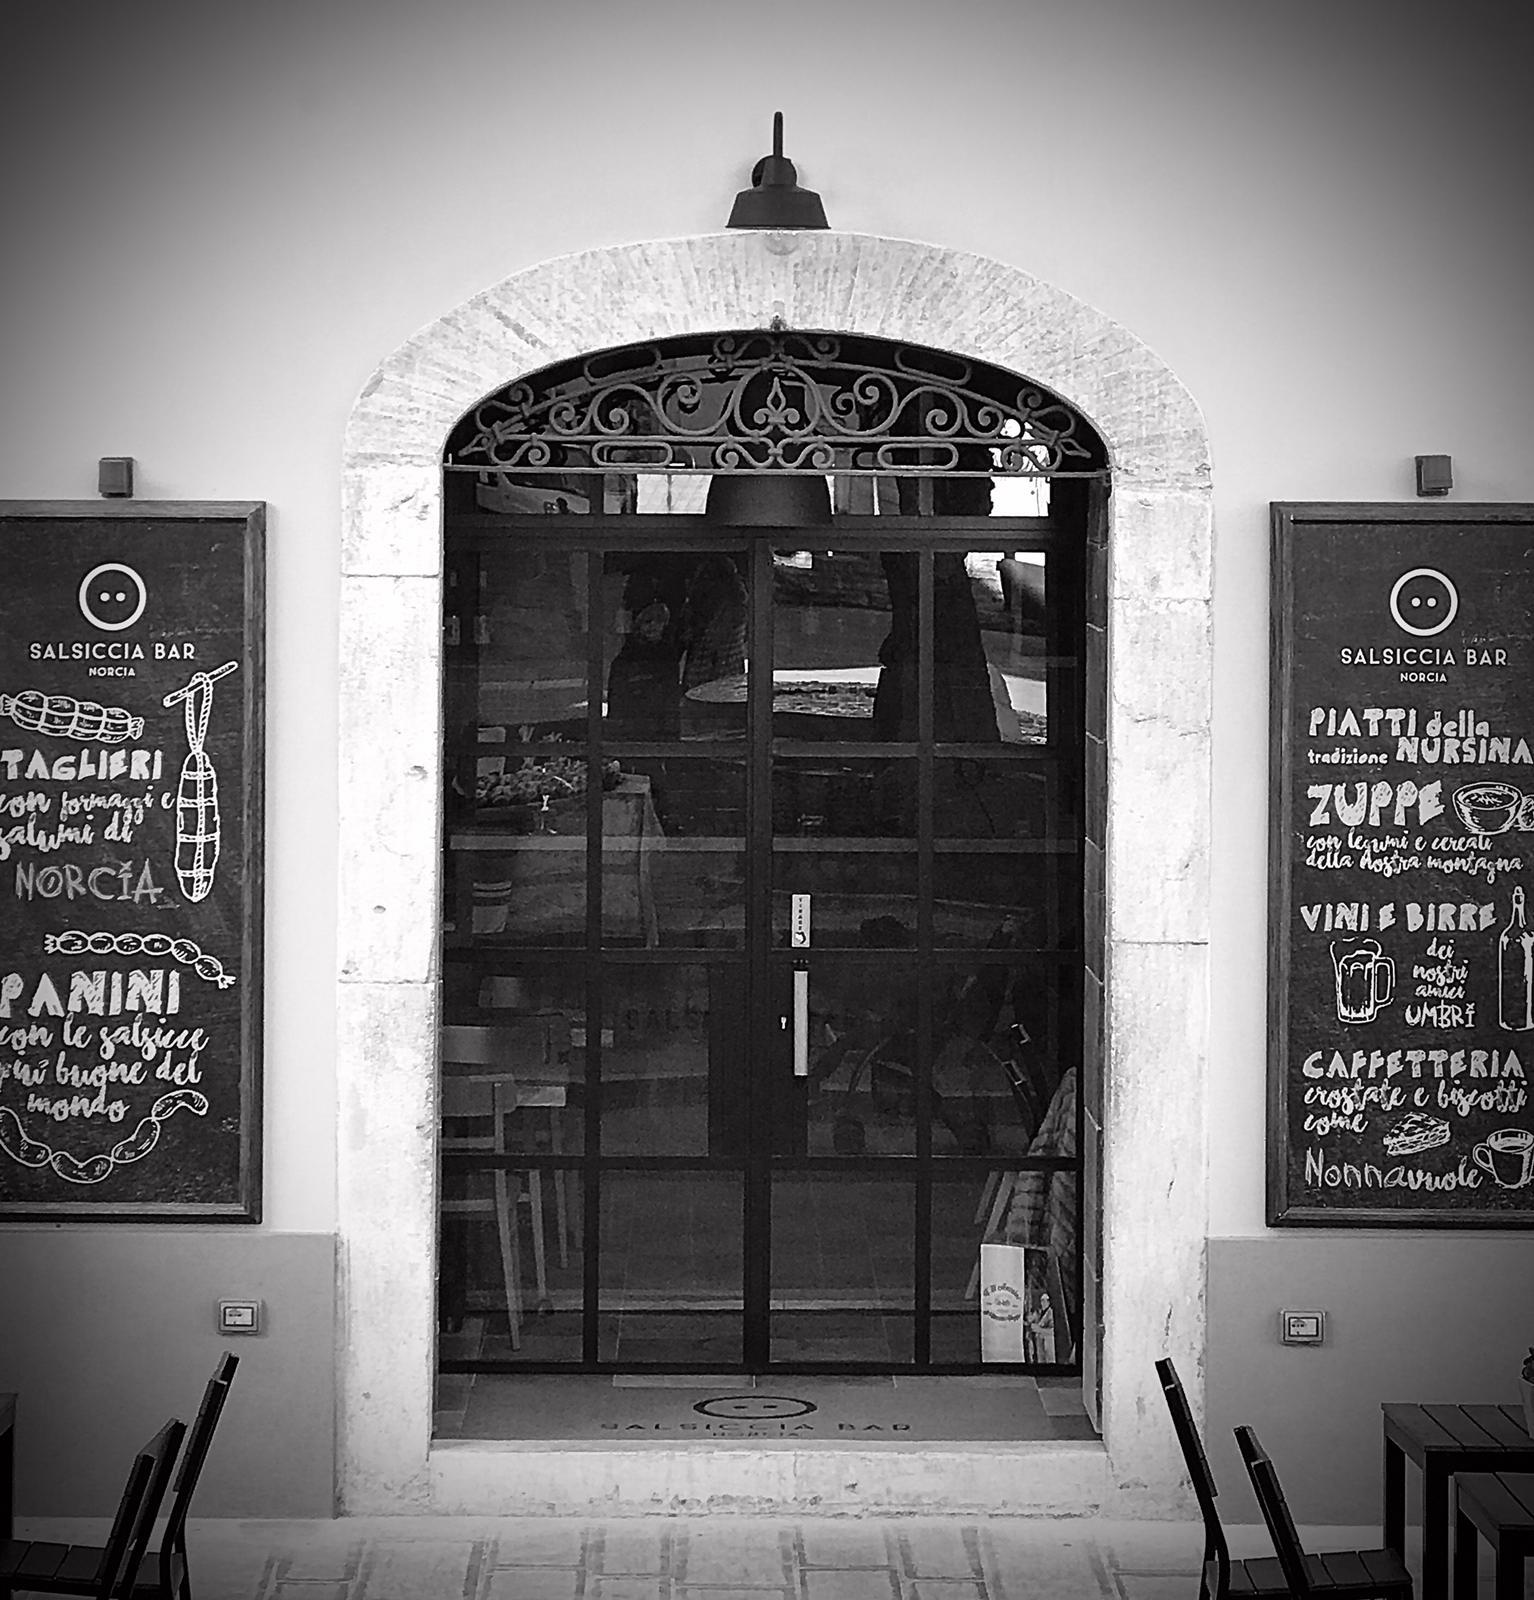 Salsiccia Bar